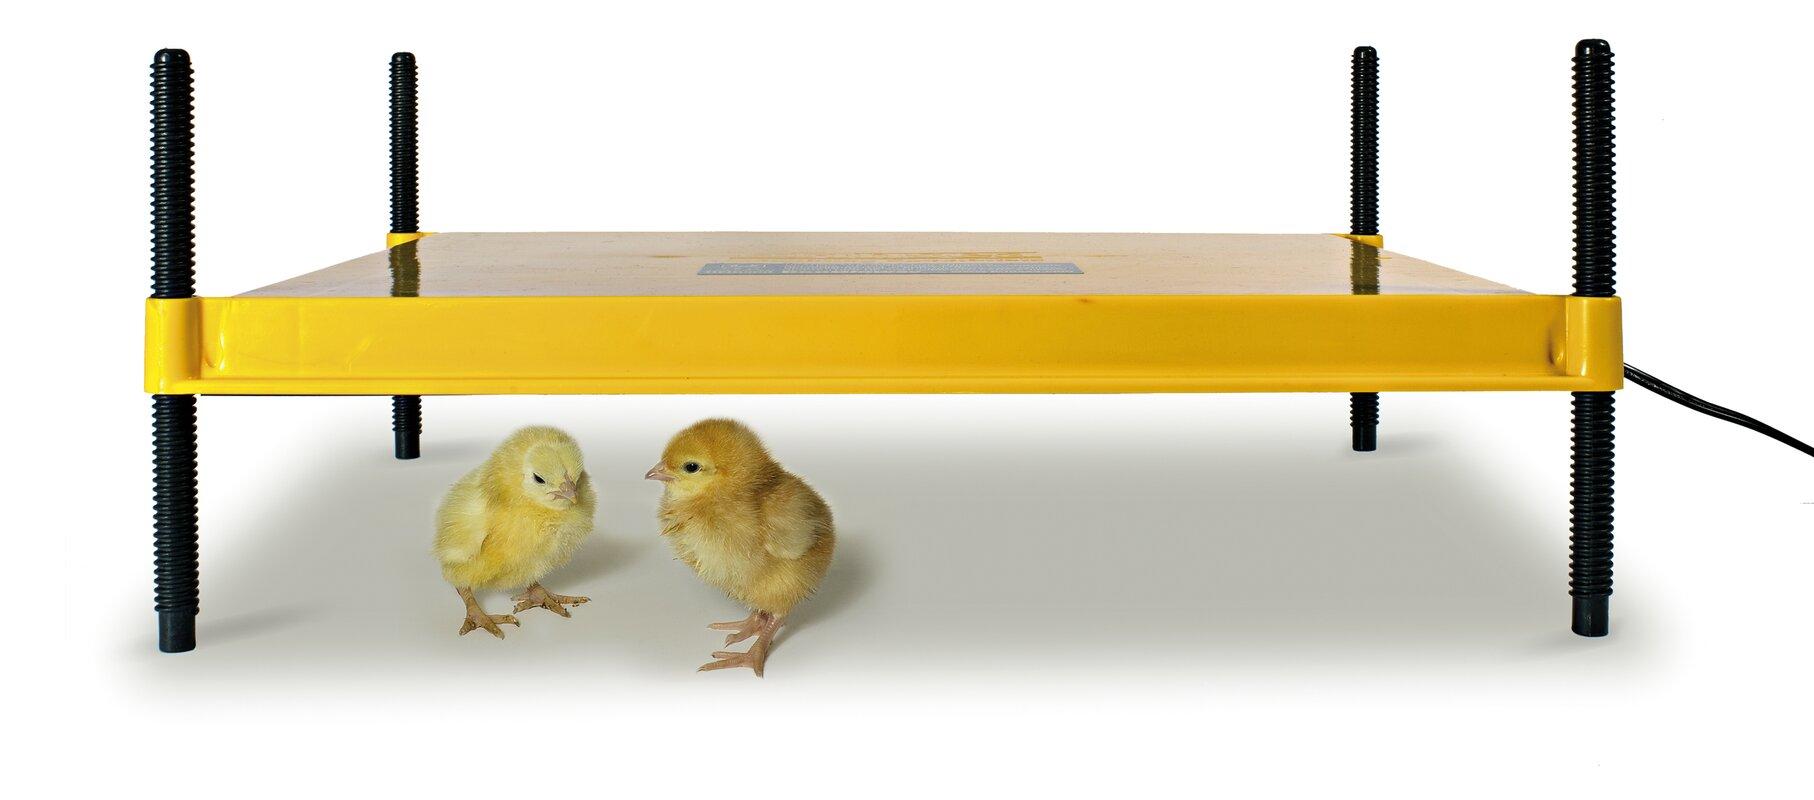 EcoGlow 50 Chick Brooder